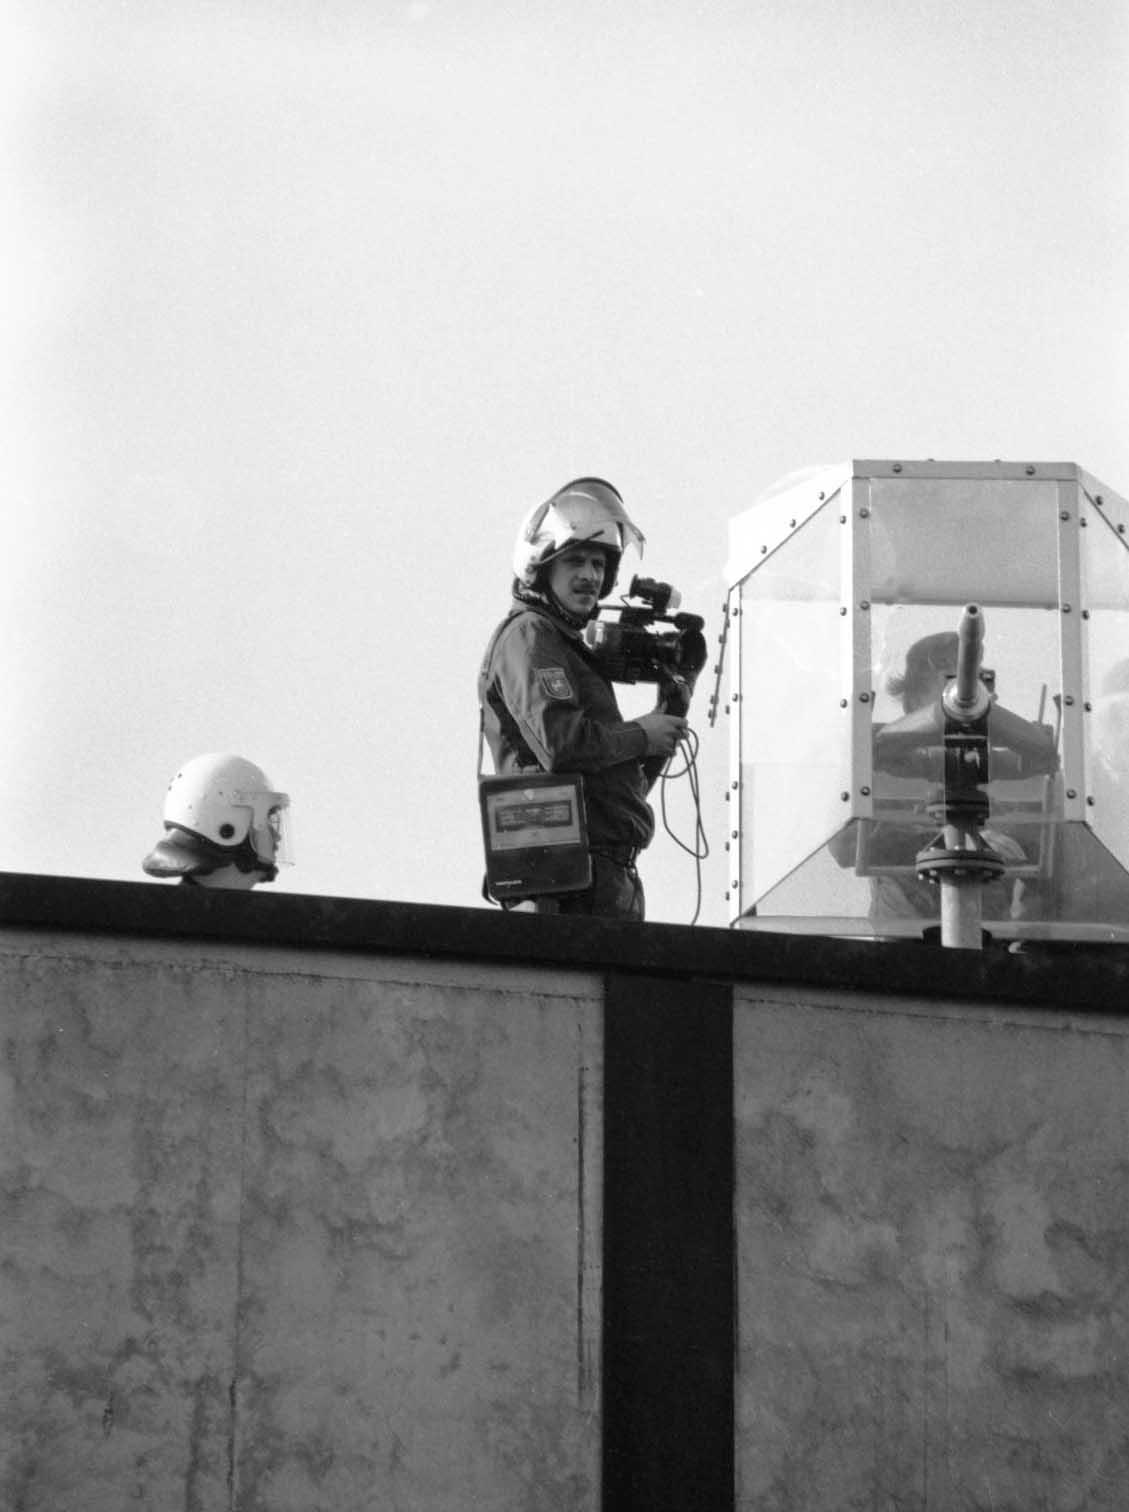 Bewacher Endlagererkundungsbergwerk 1990